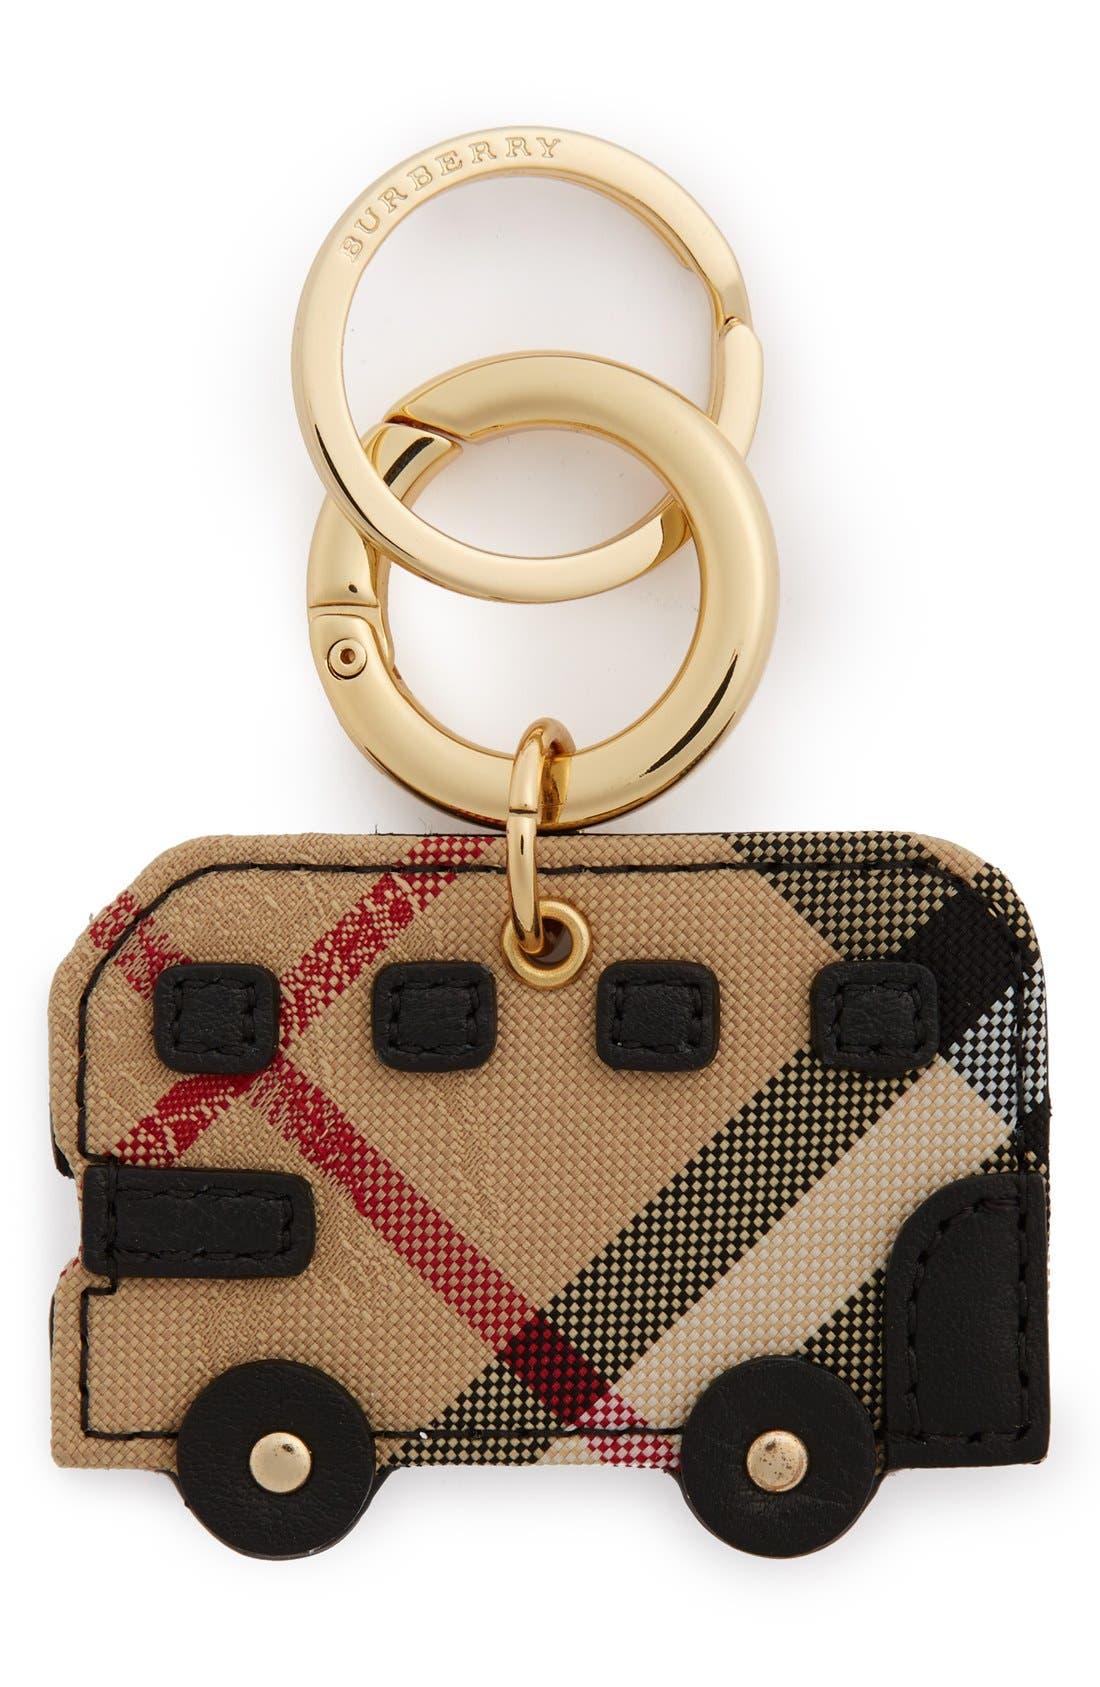 Main Image - Burberry 'Horseferry Check' London Bus Bag Charm